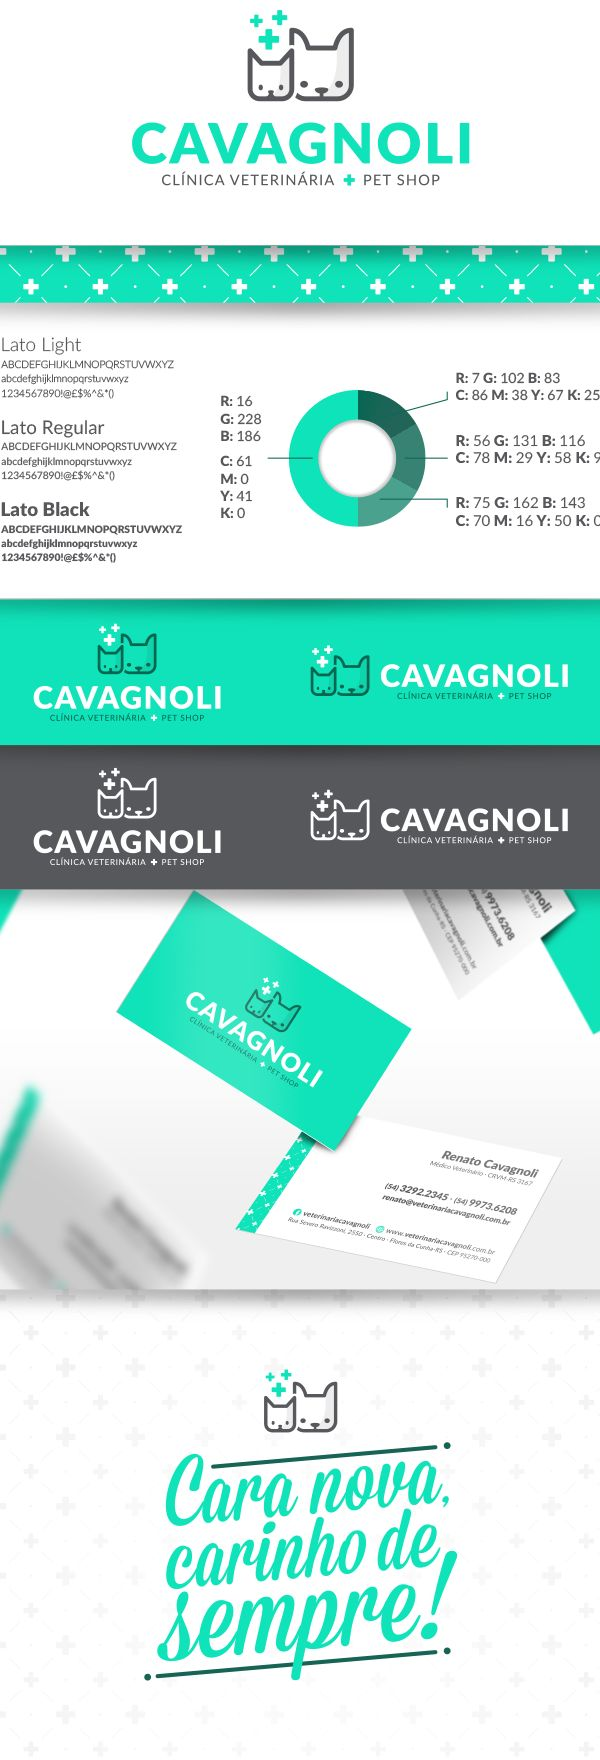 Cavagnoli Clínica Veterinária + Pet Shop on Behance